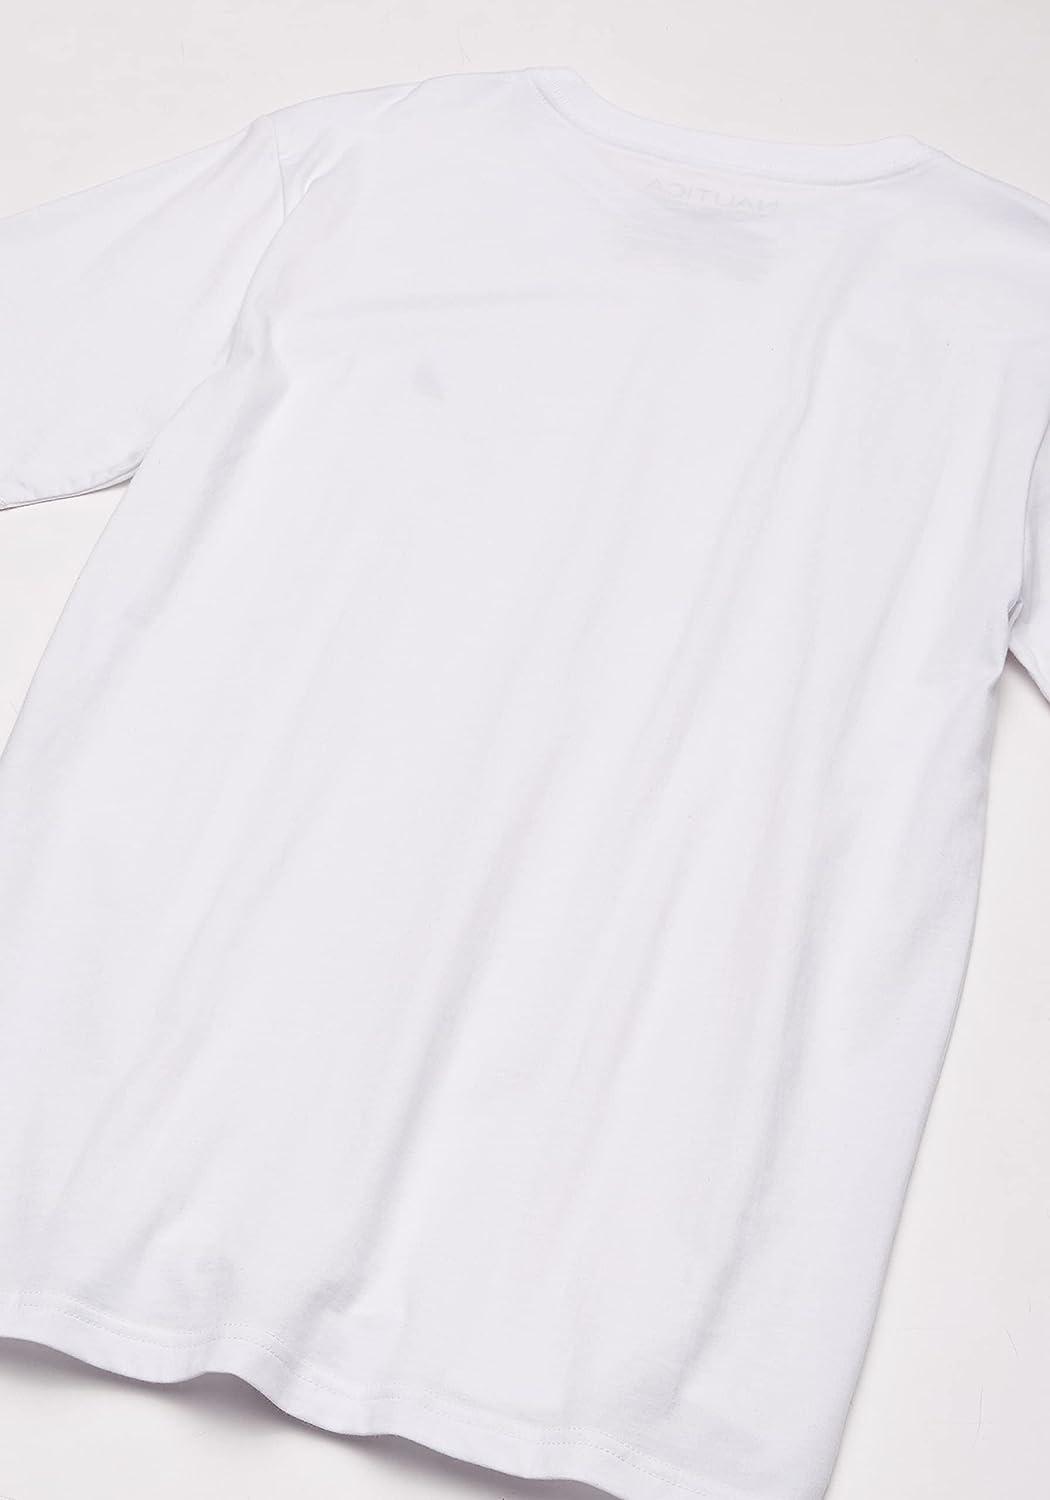 Nautica Boys' Short Sleeve Solid V-Neck T-Shirt